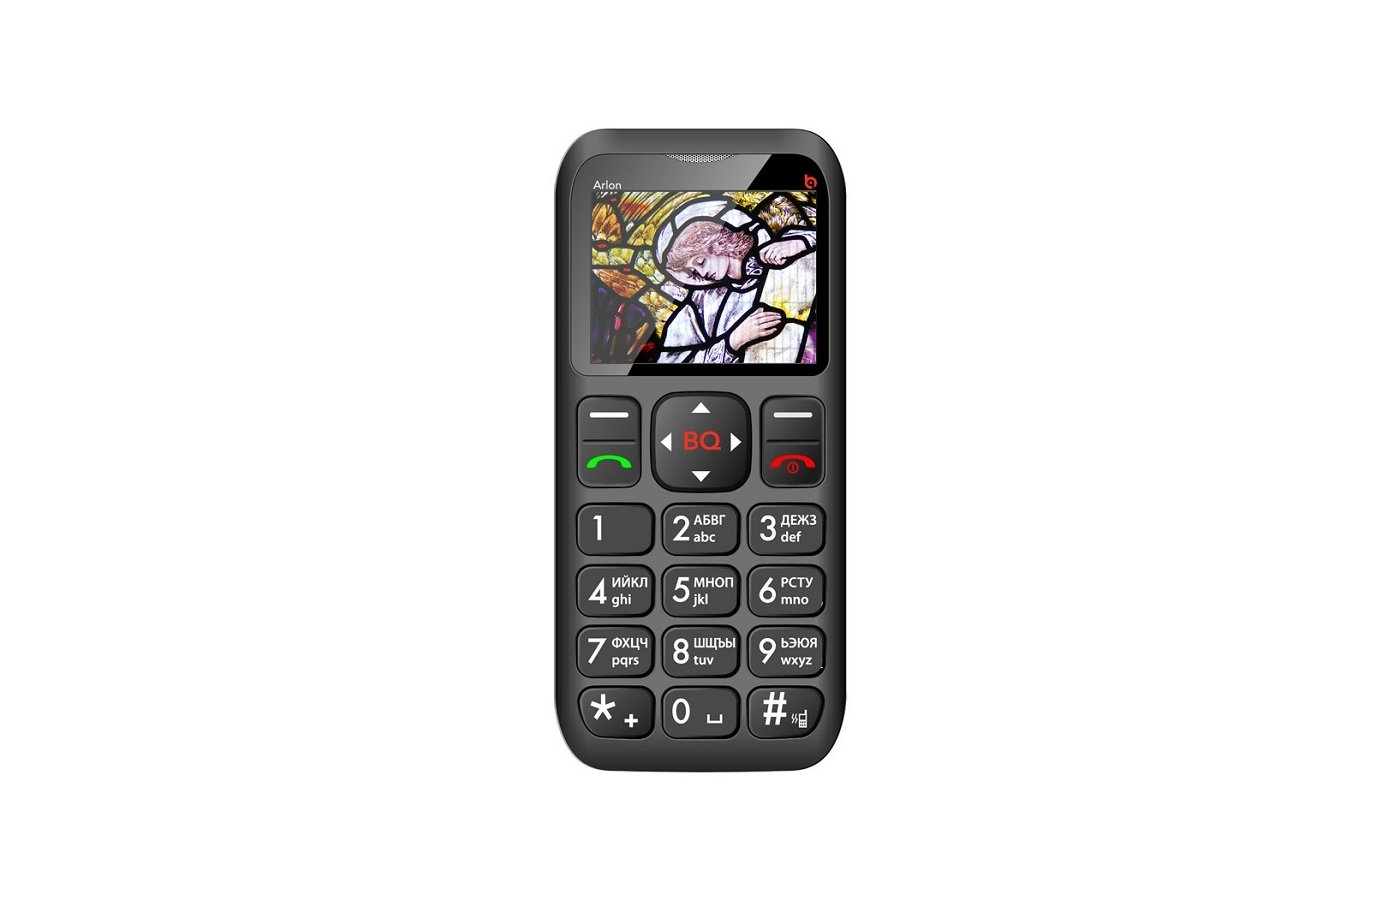 Мобильный телефон BQ BQM-1802 Arlon Black